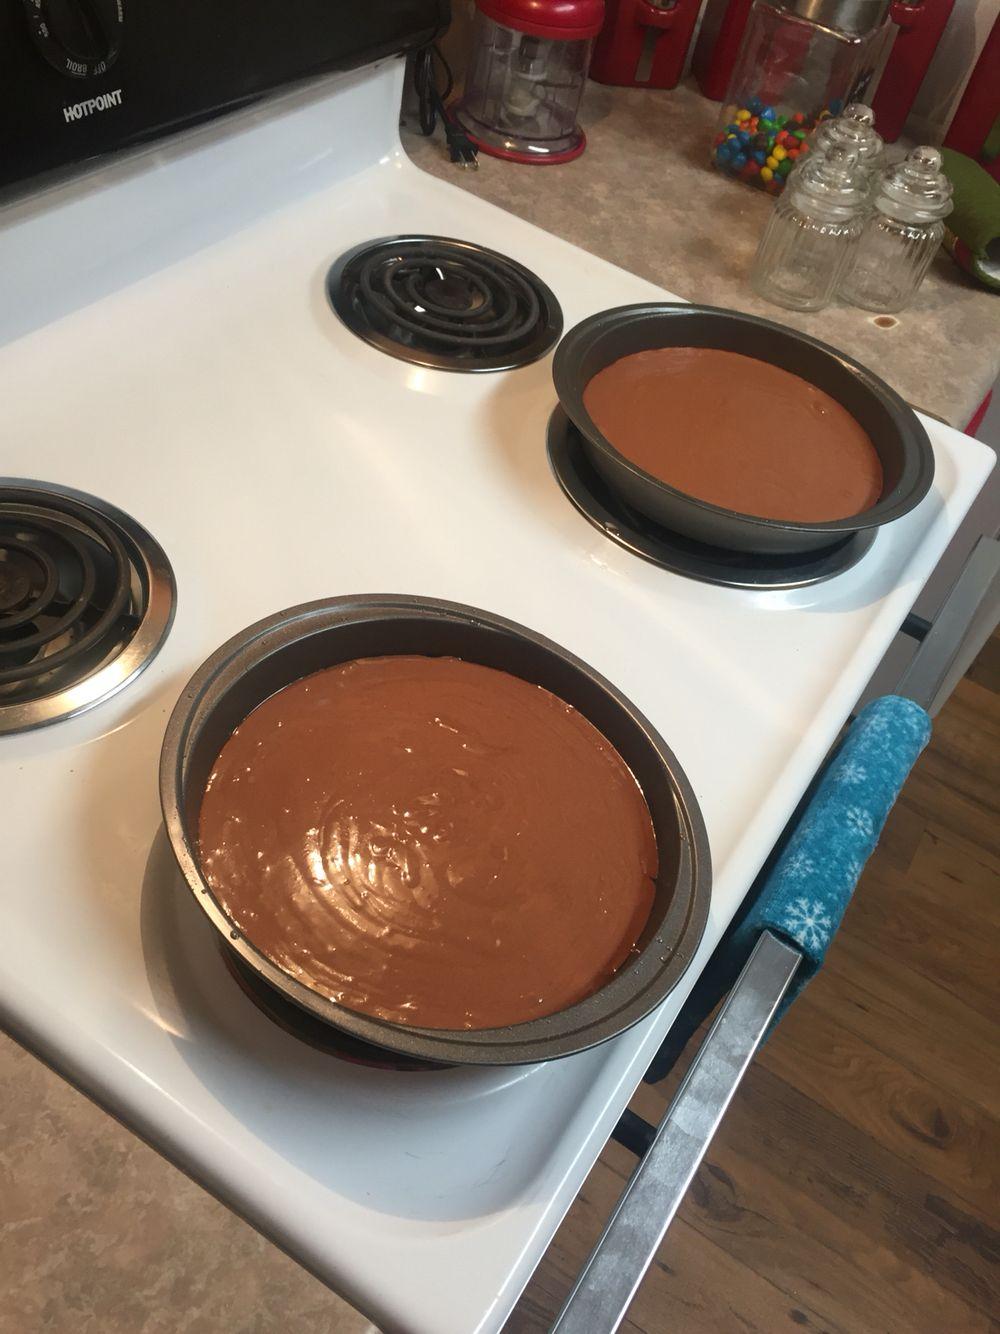 Chocolate cake soon to be